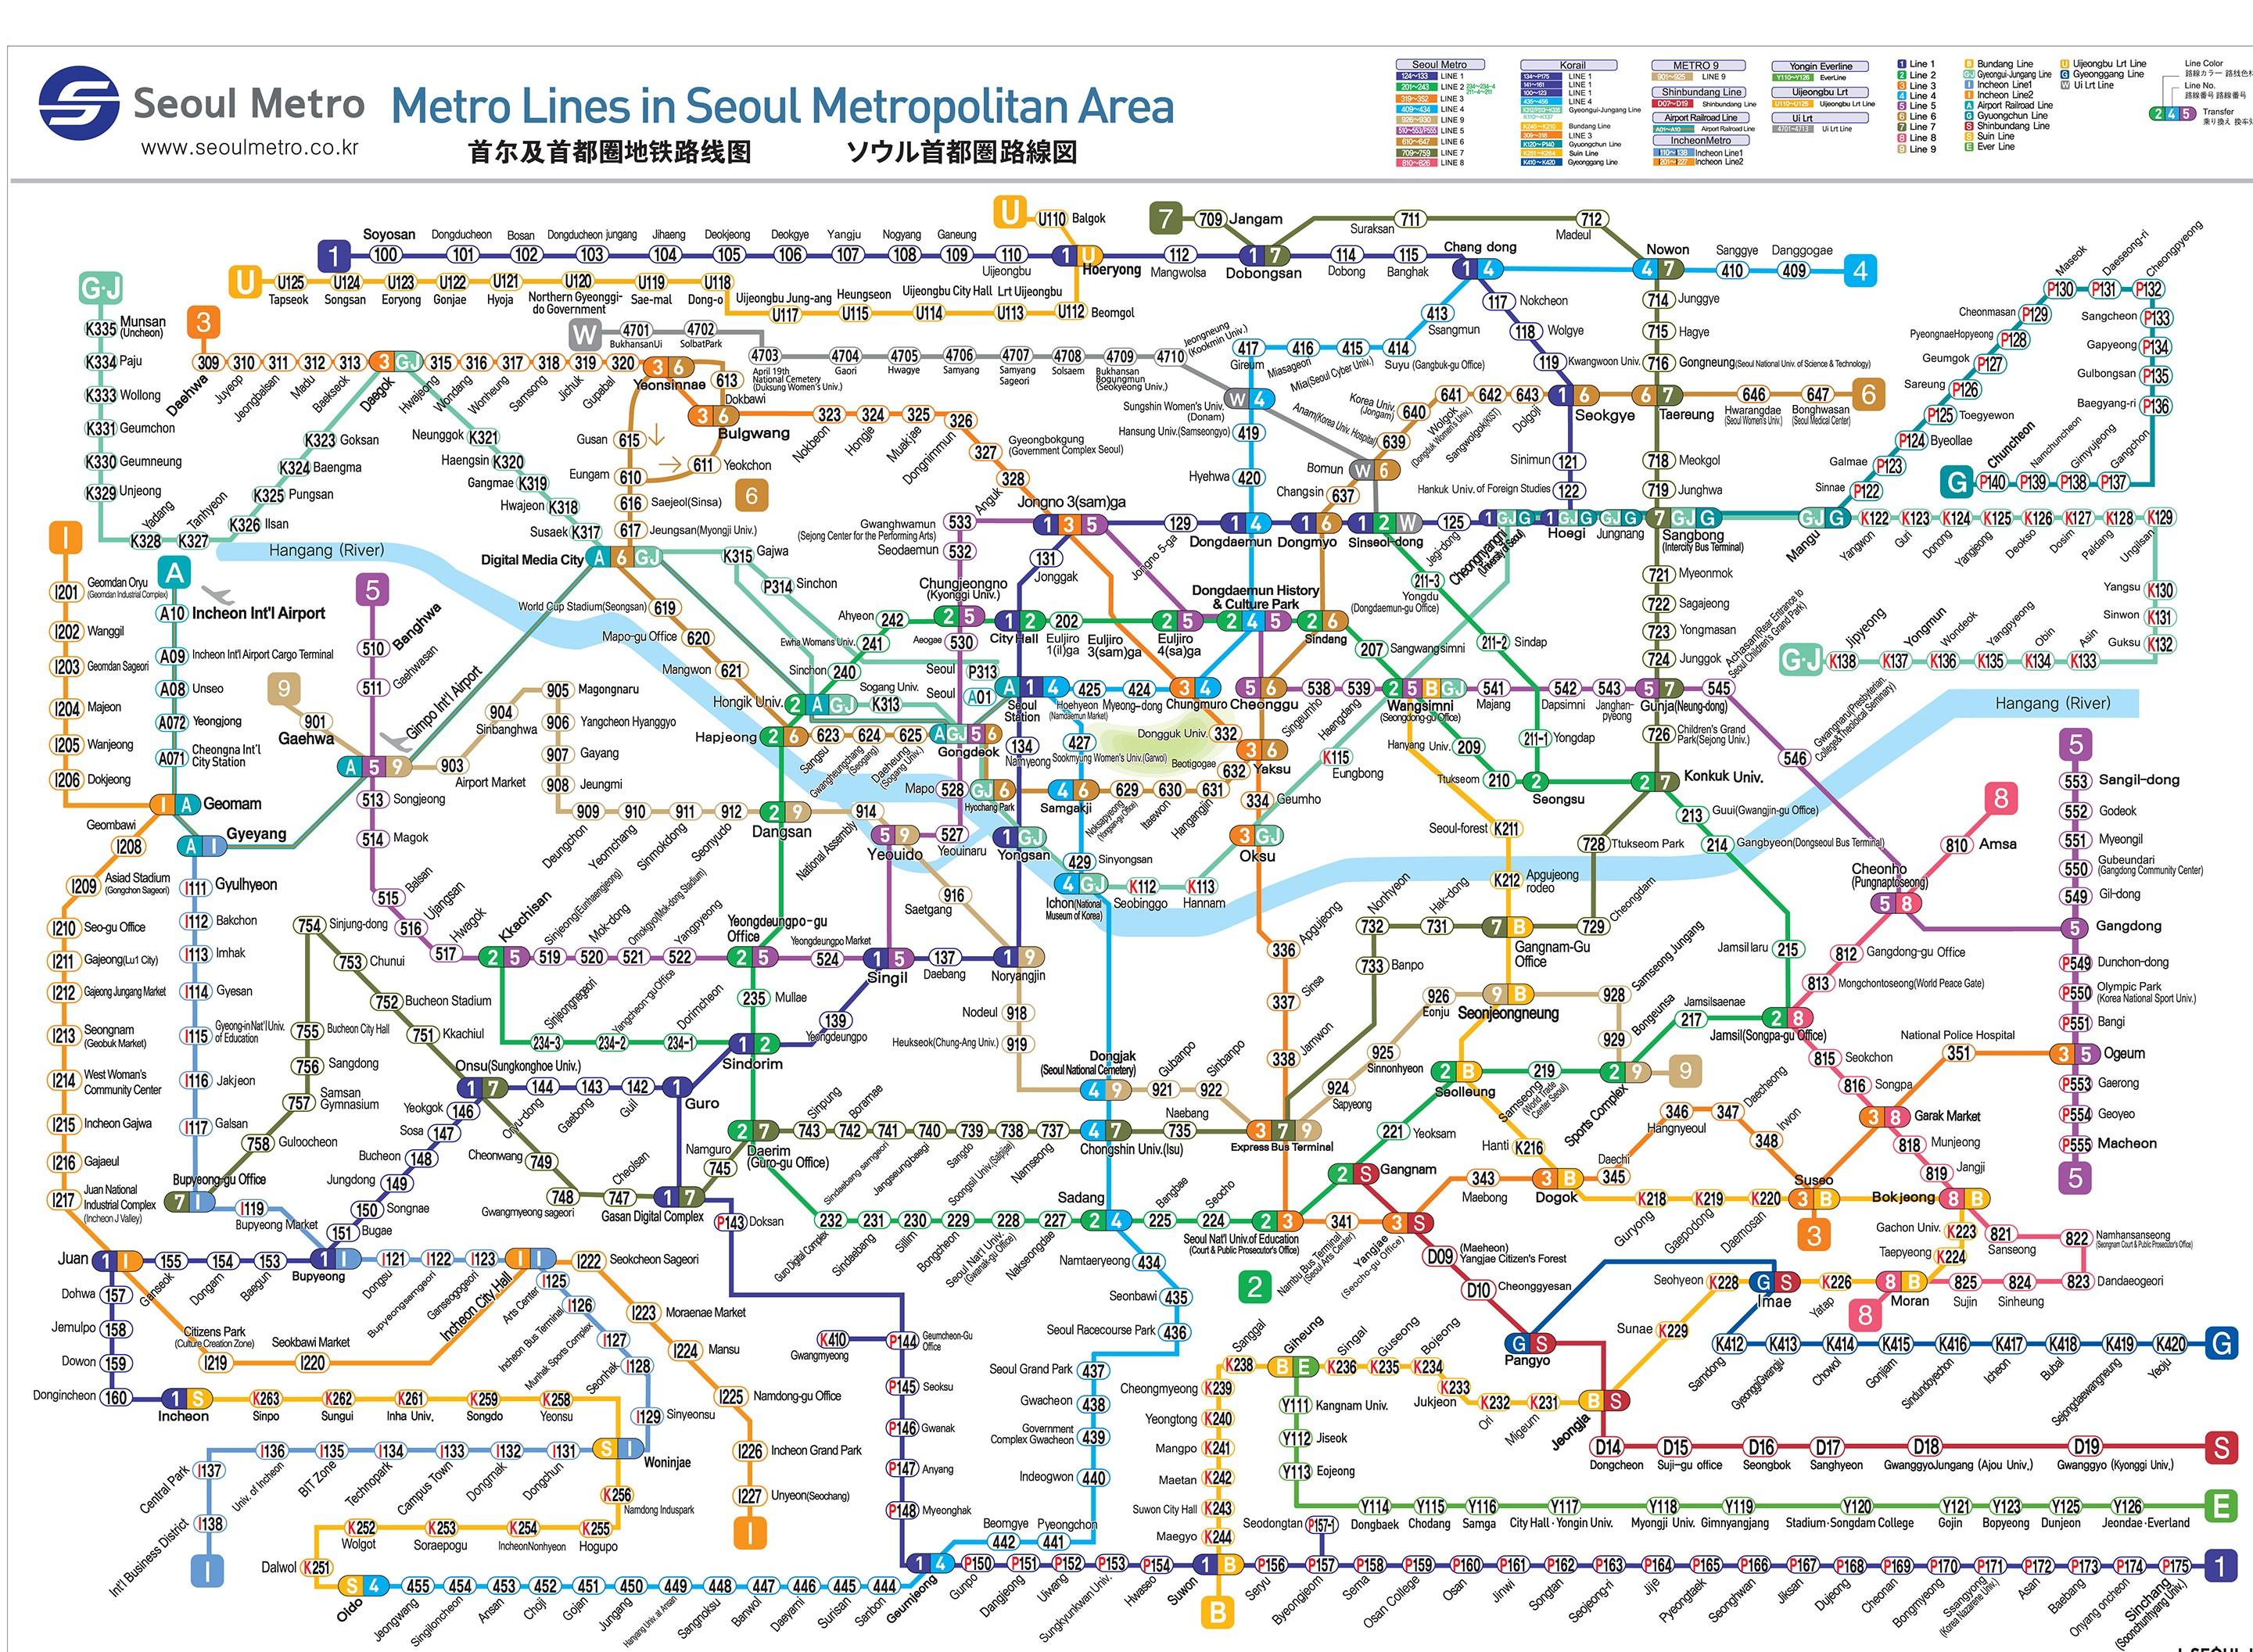 Seoul Subway Map Seoul Subway Metro Map English Version (Updated) Seoul Subway Map